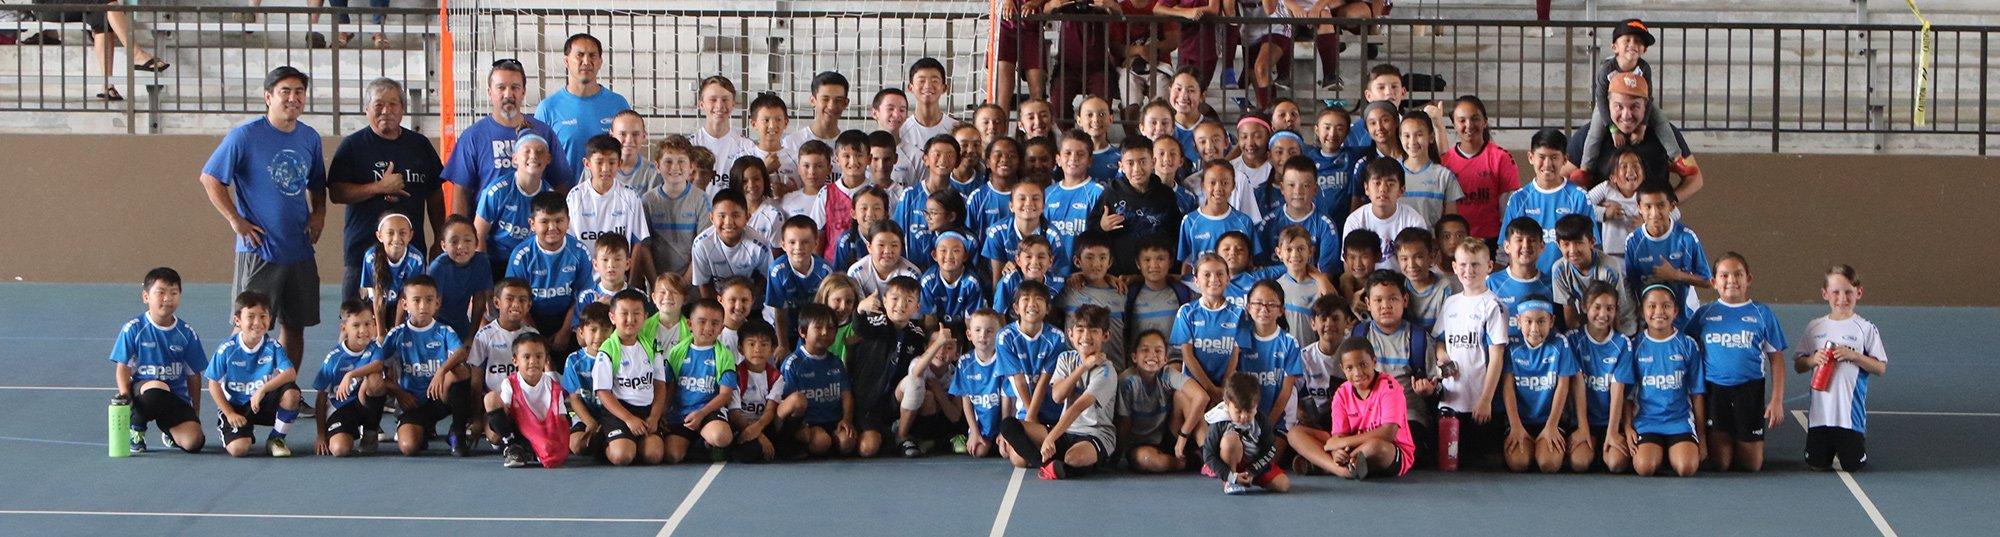 Hawaii Rush Big Island at the 2020 Hilo Mini Big Soccer Tournament